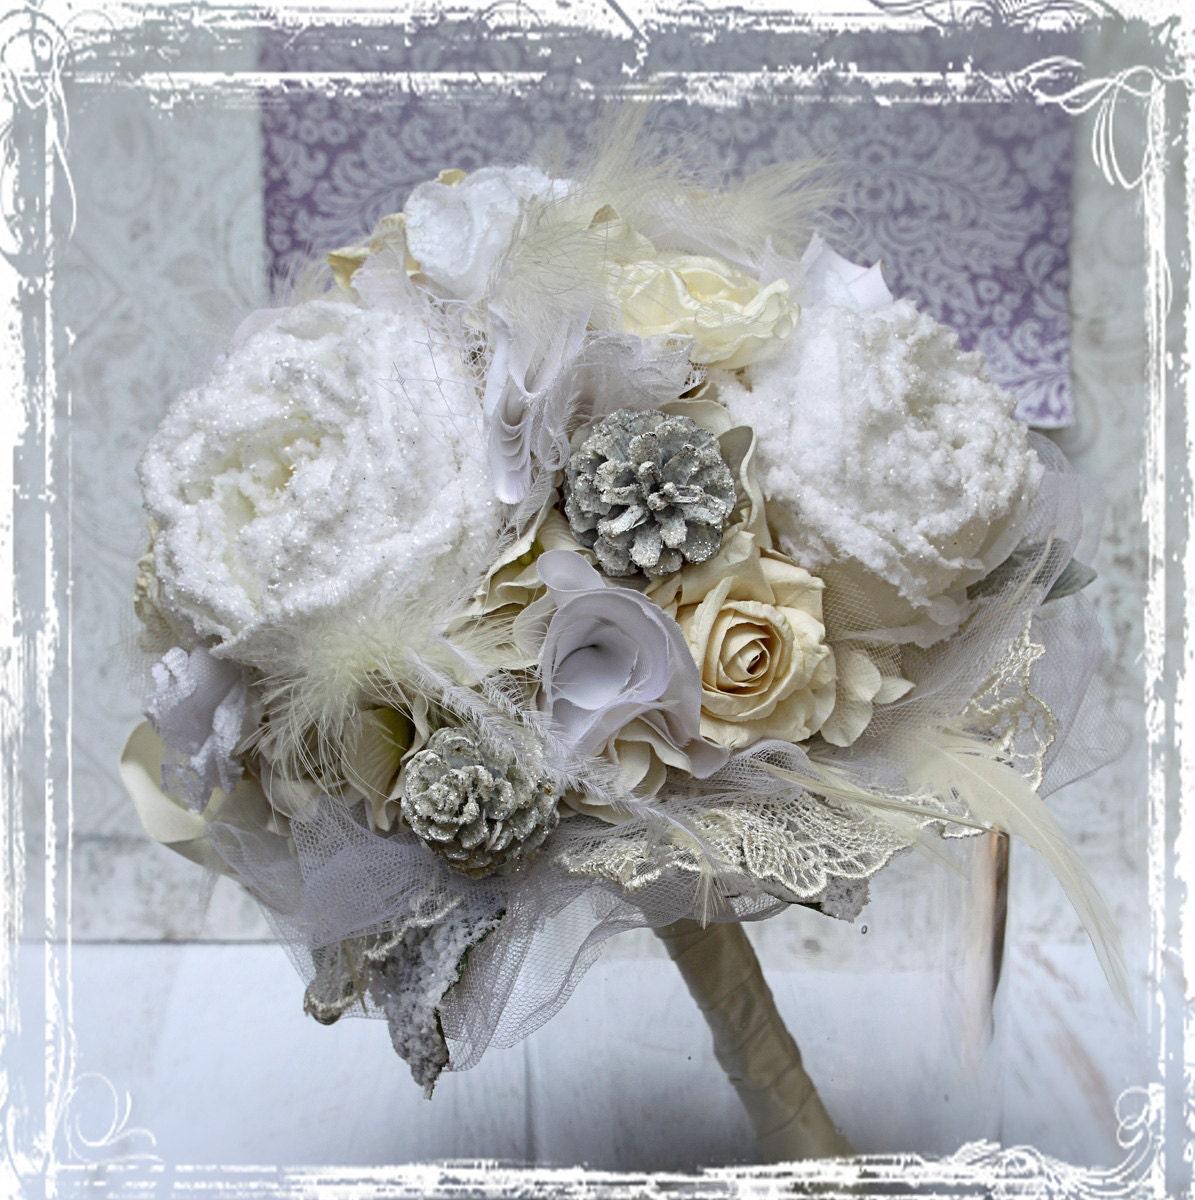 Winter White Wedding Flowers: Snowflake Fantasy Bouquet Winter White Wedding Bridal Peony